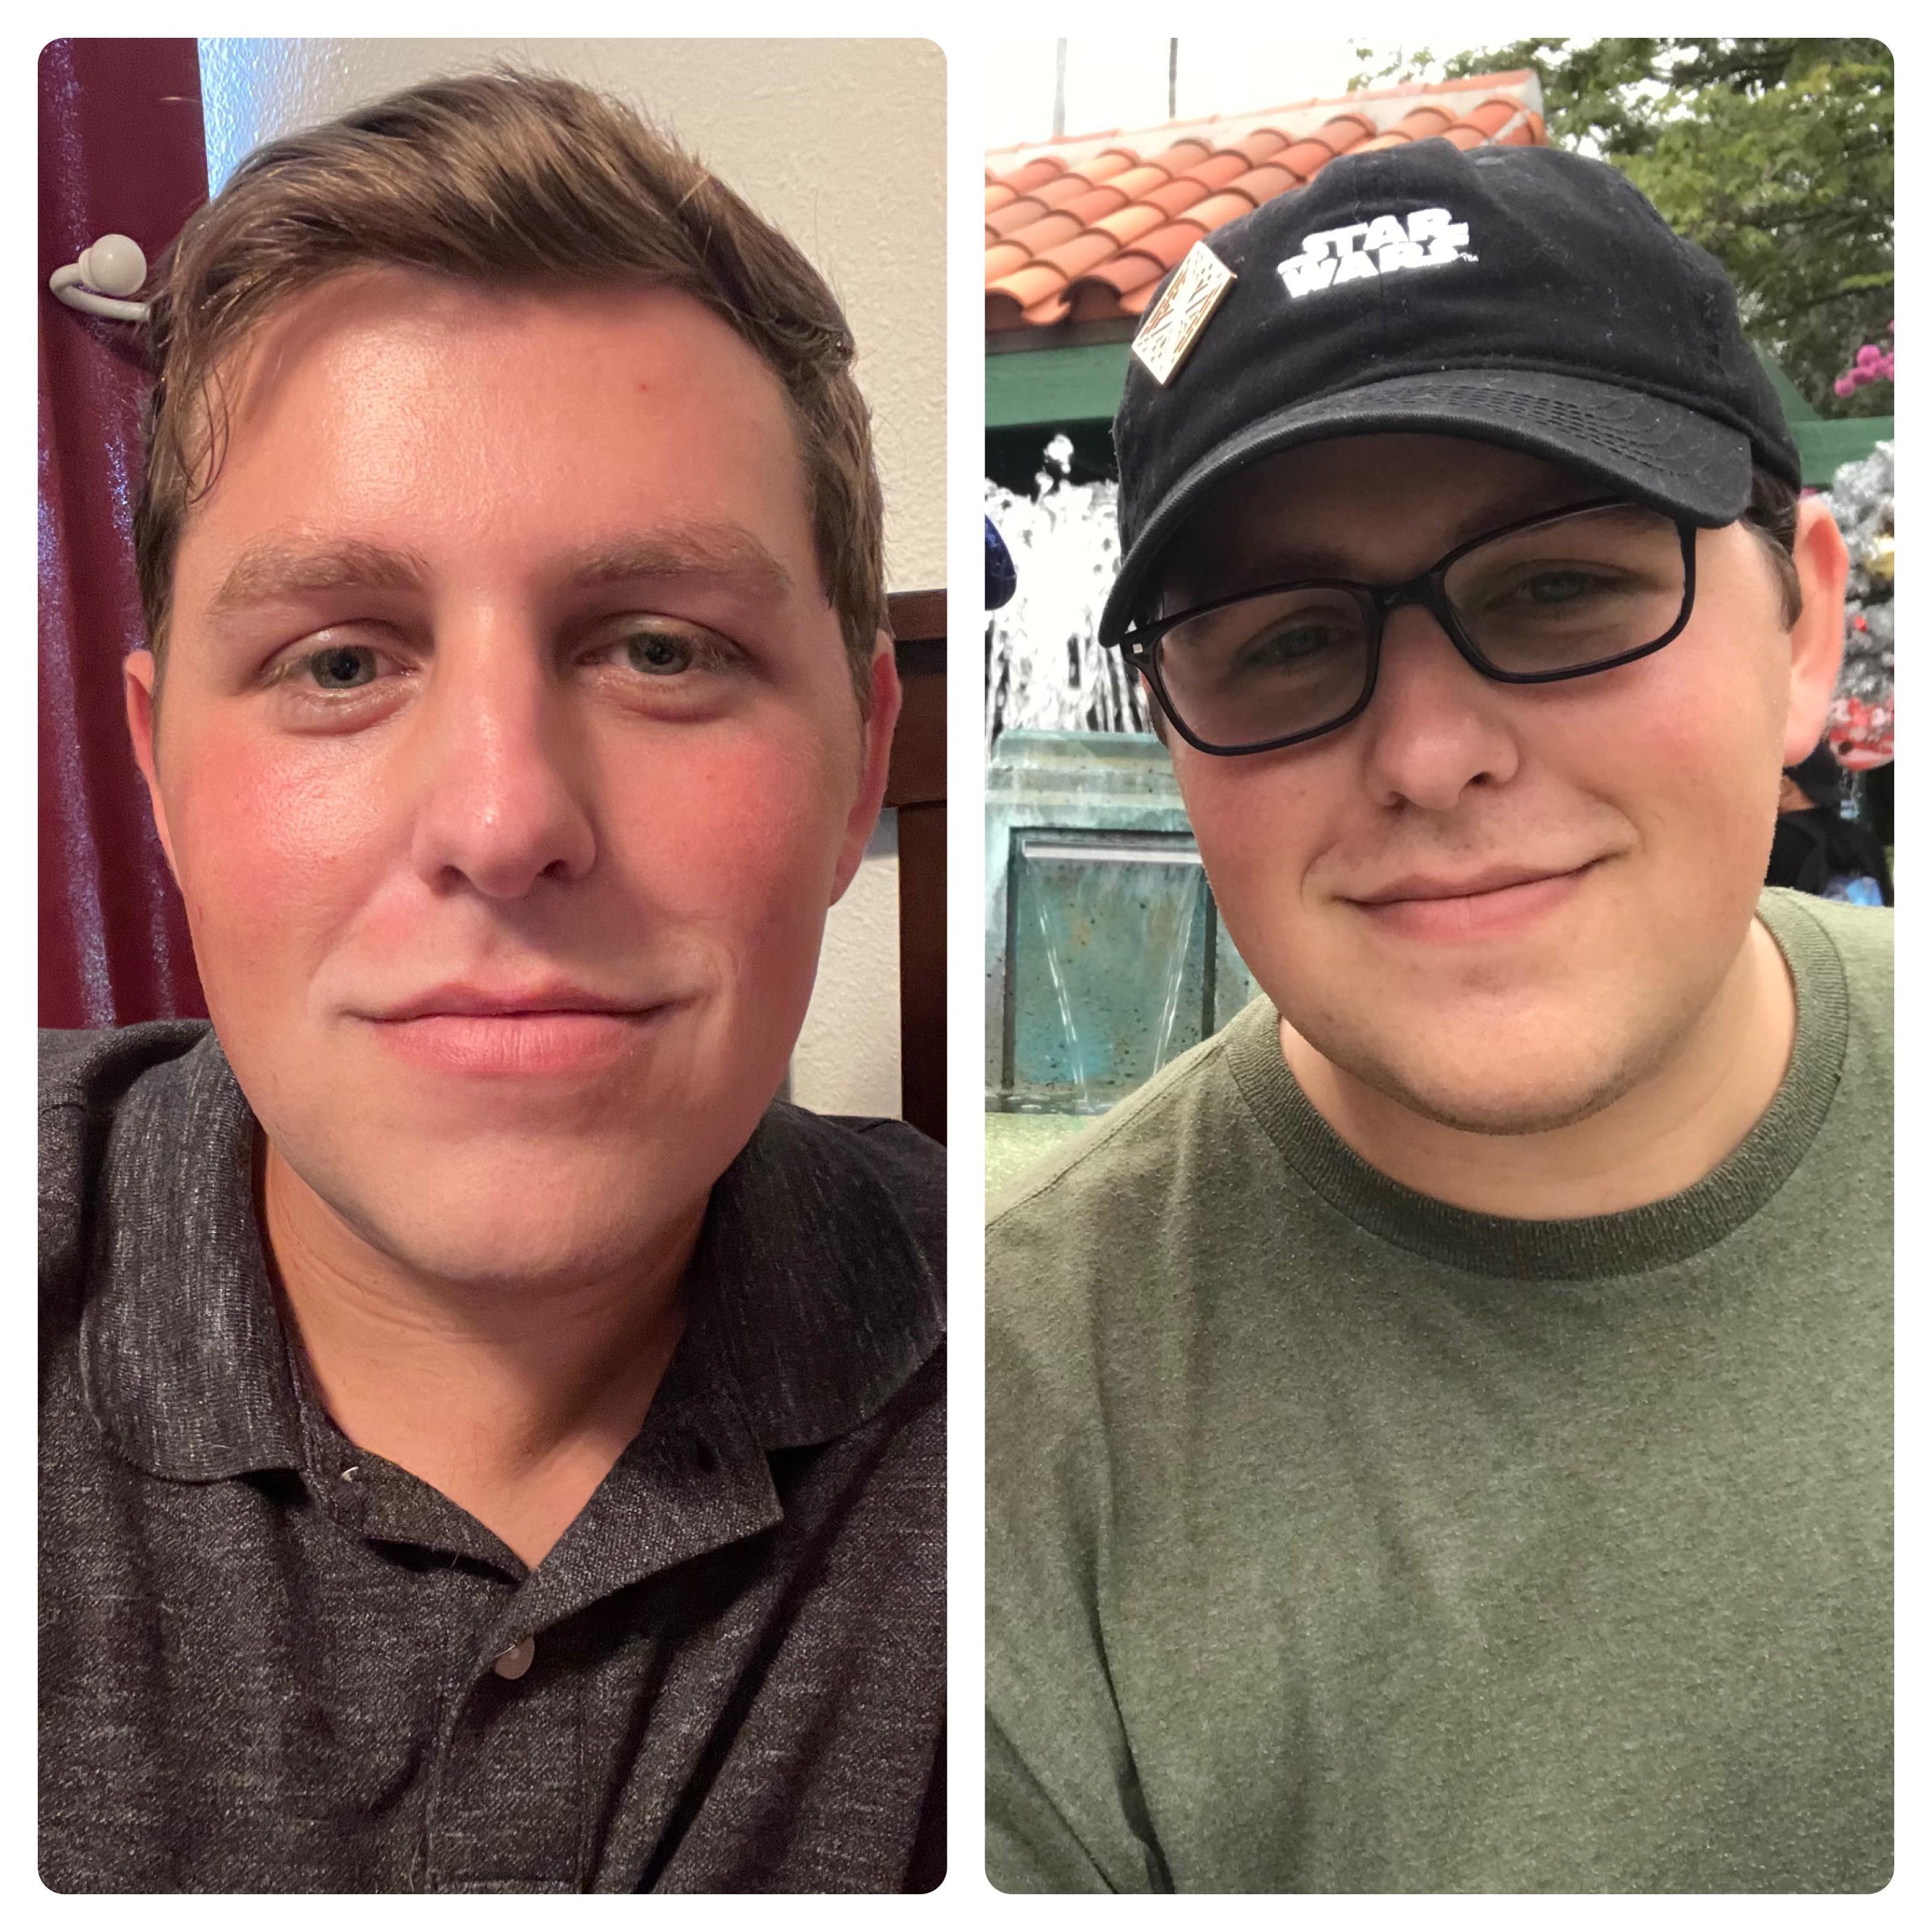 6'1 Male 47 lbs Weight Loss 266 lbs to 219 lbs